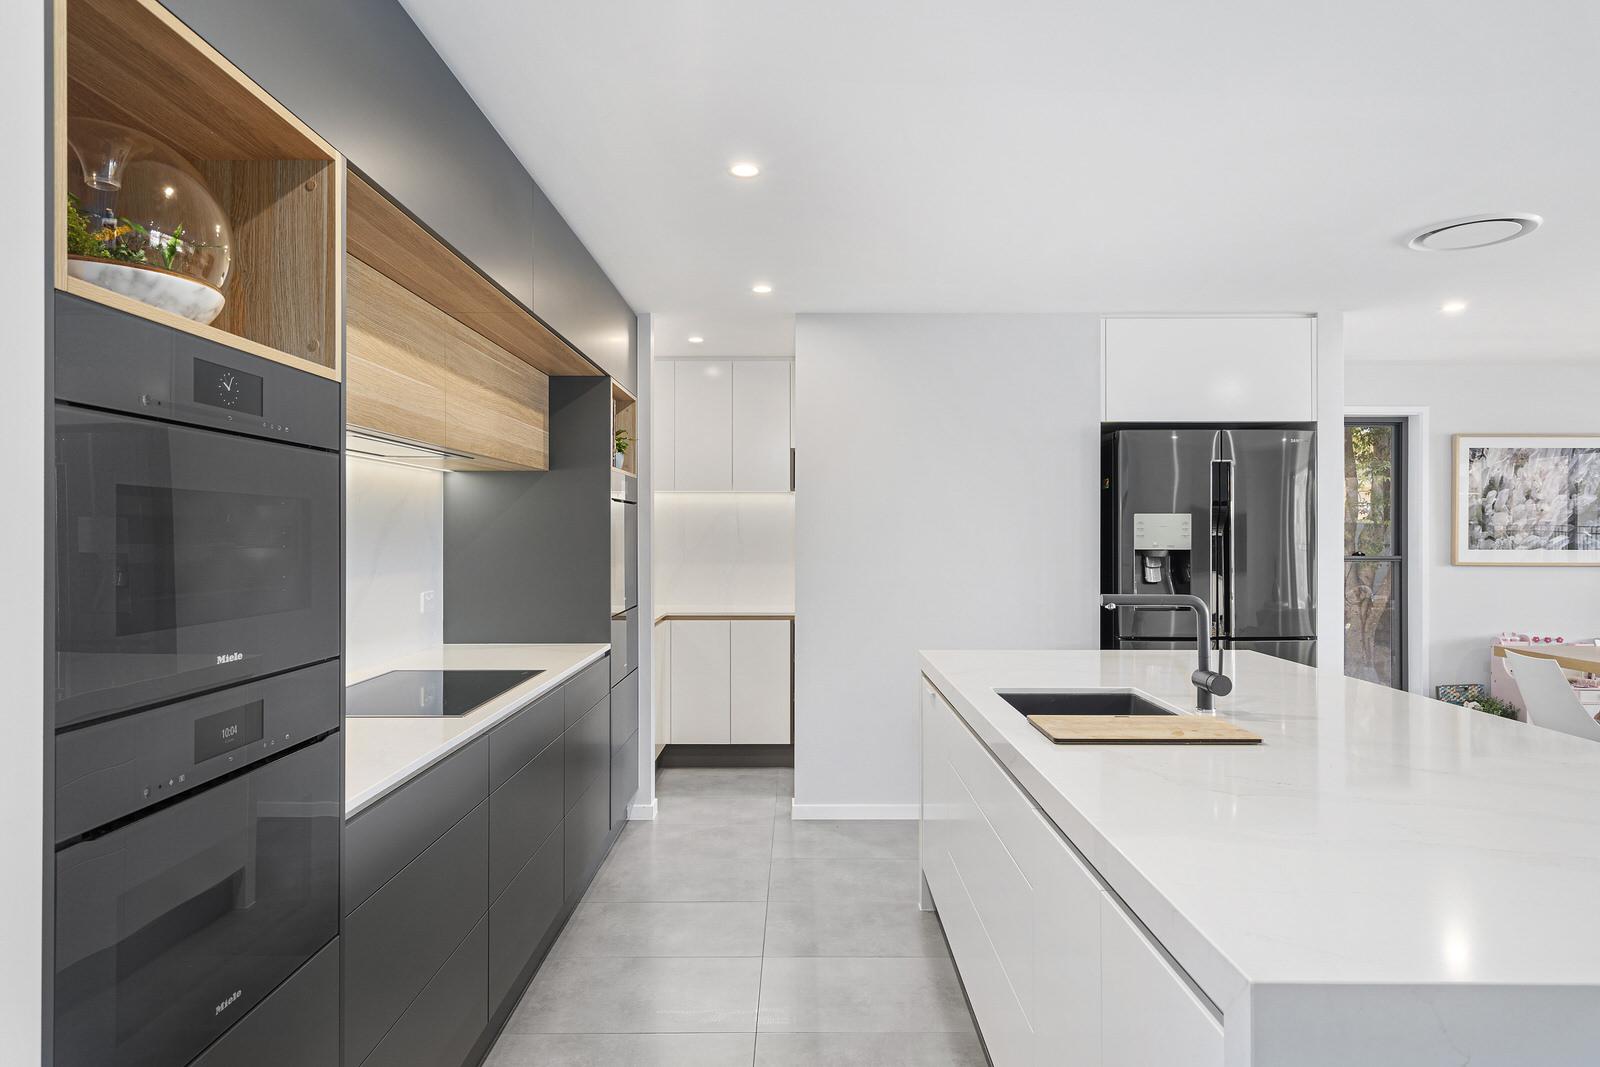 Sorrento kitchen renovation modern sleek design. Grey, white and wood finishes